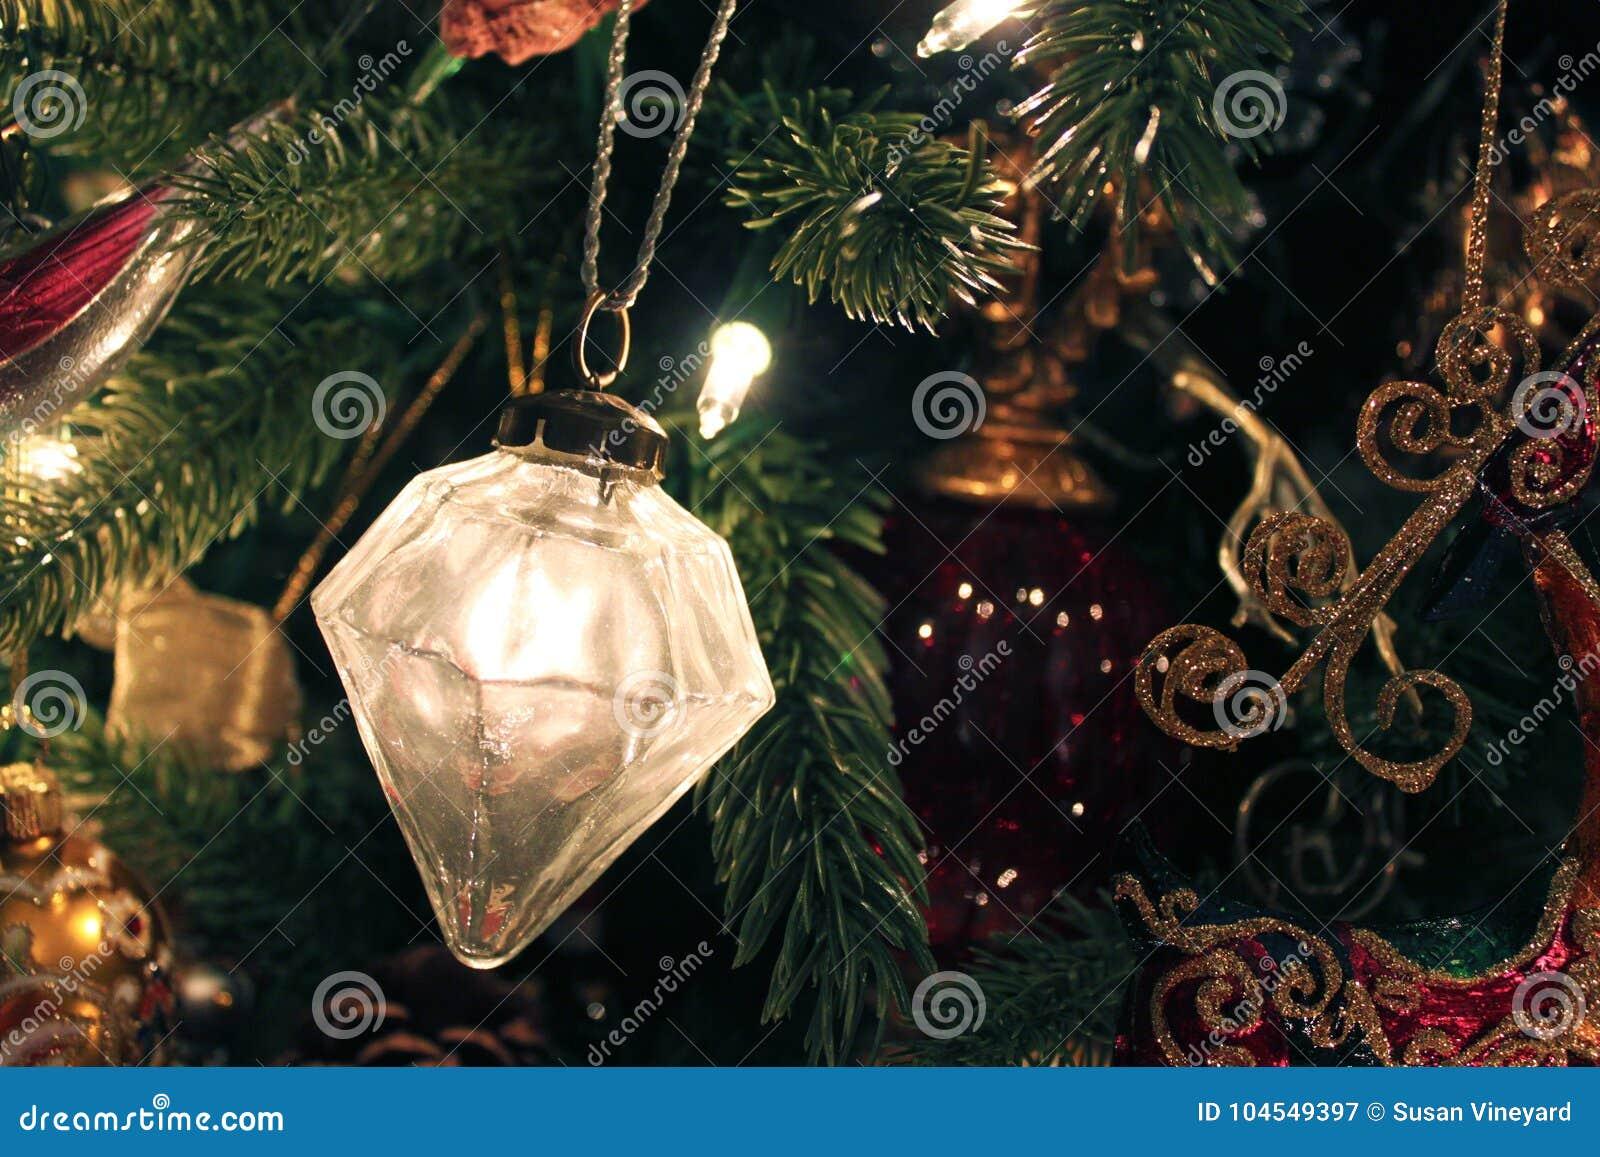 Mercury Glass Ornament On Christmas Tree Stock Image - Image of ...